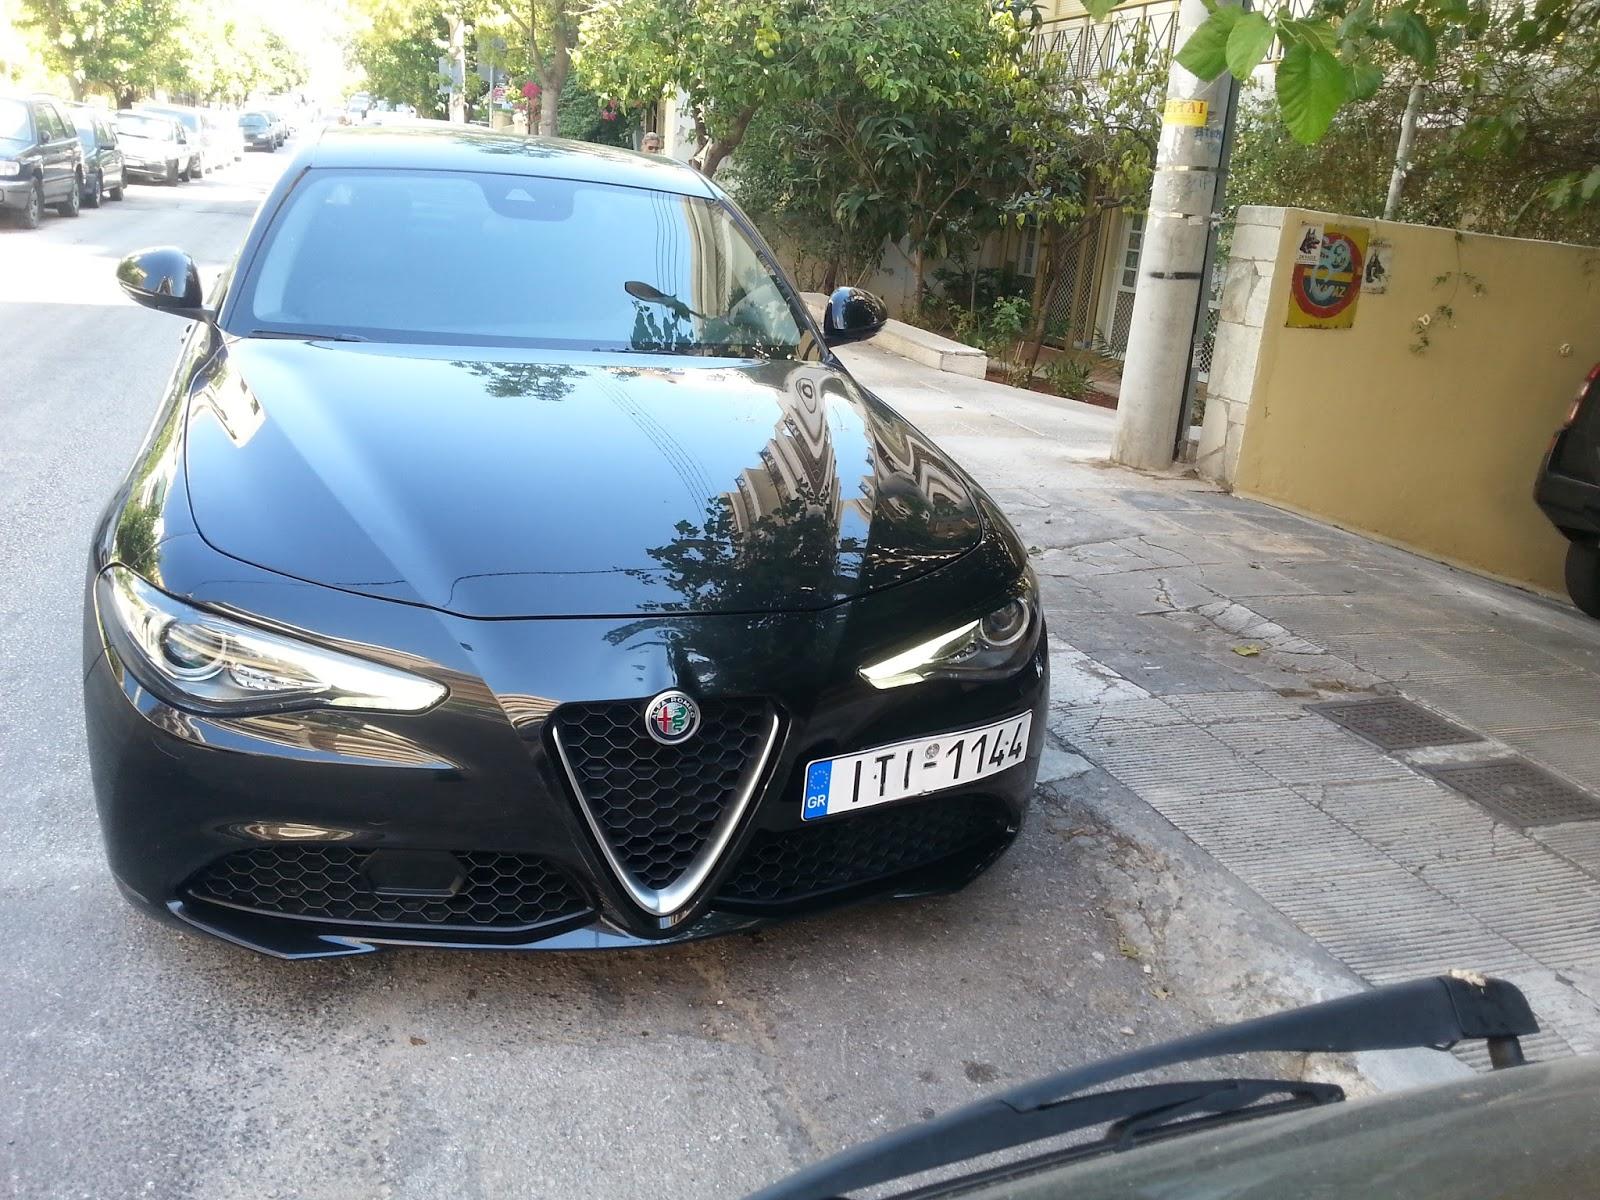 a5 1 Είναι η Alfa Romeo Giulia τόσο καλή όσο λένε; Alfa, alfa romeo, Alfa Romeo Giulia, TEST, ΔΟΚΙΜΕΣ, οδηγούμε